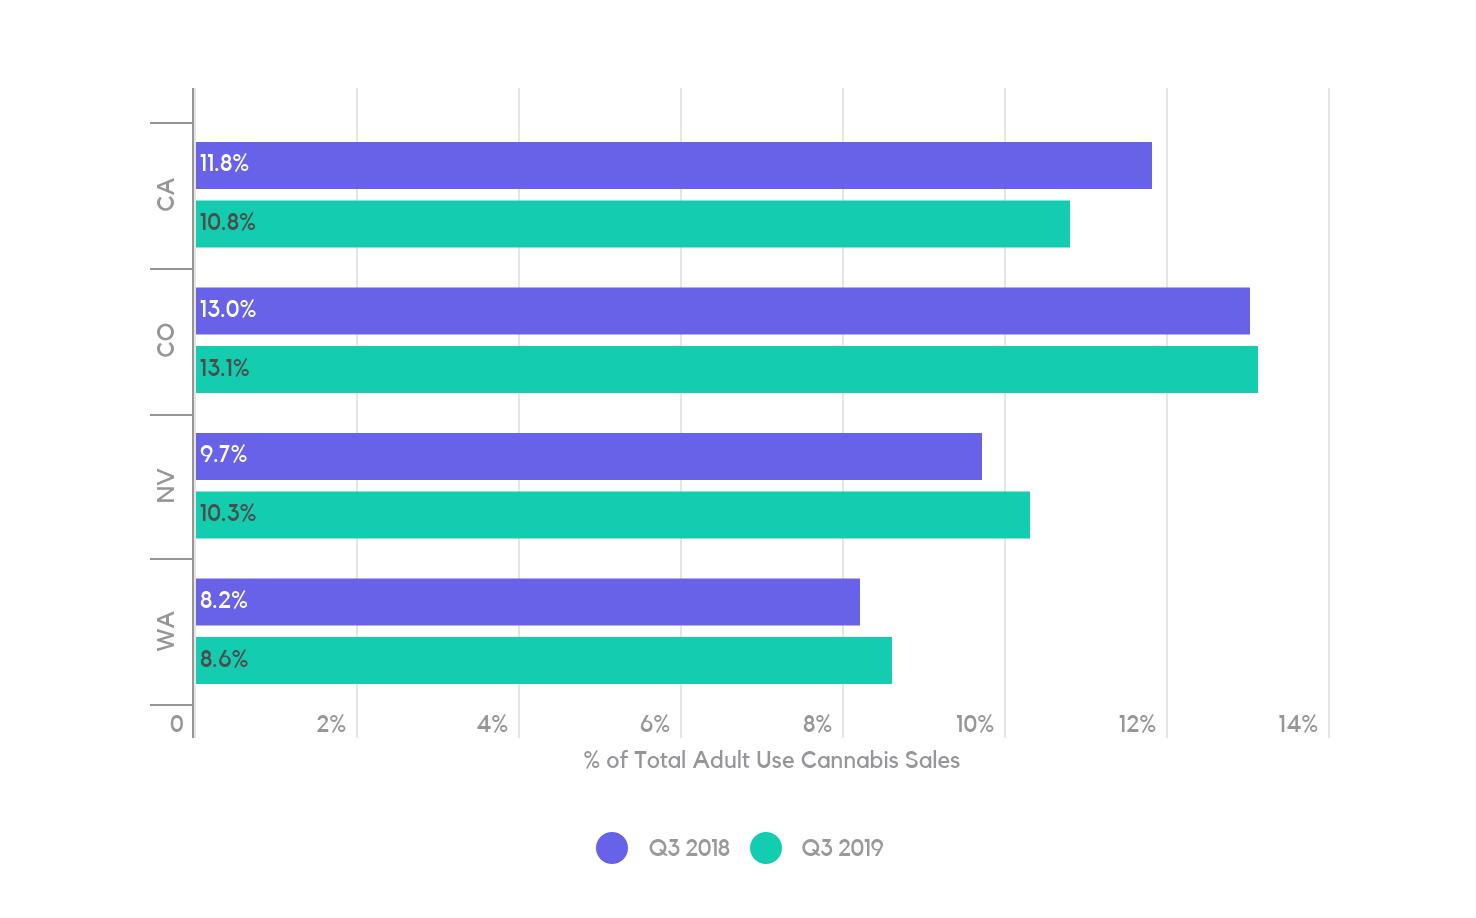 Cannabis edibles Sales Market Share – 2018 vs. 2019